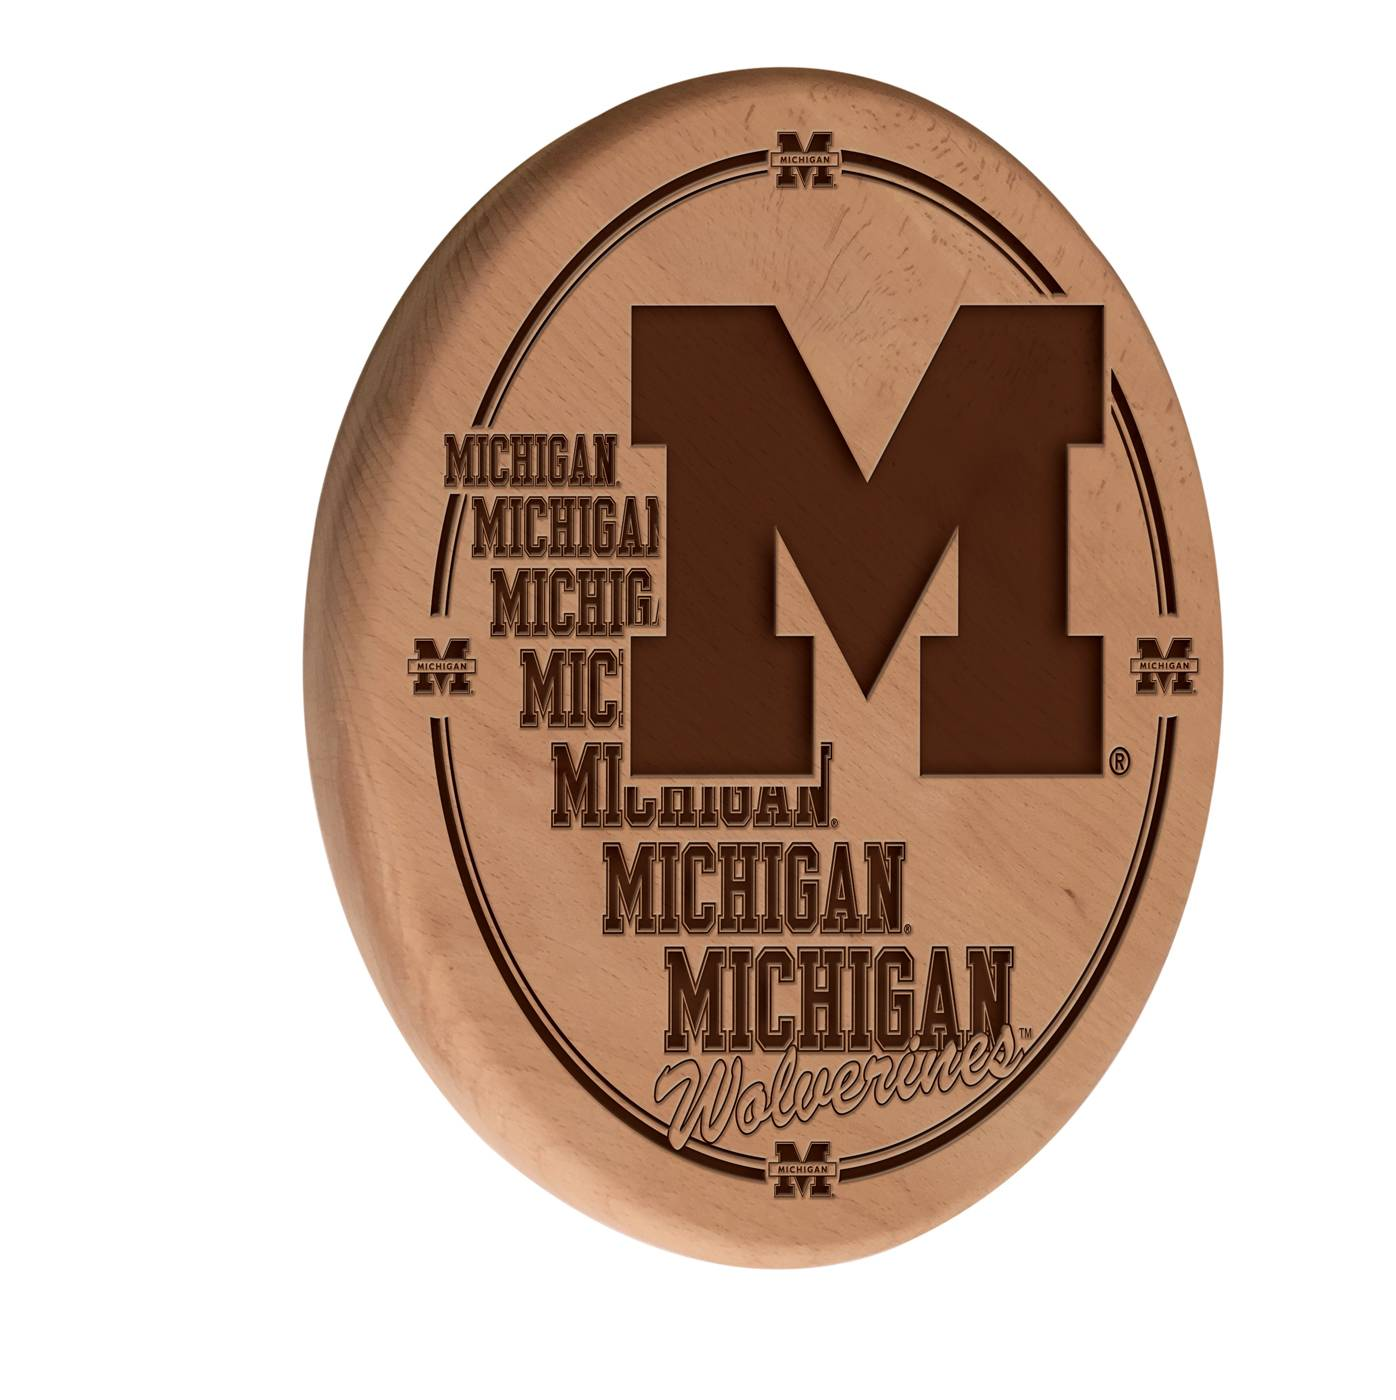 Michigan Wolverines Laser Engraved Wood Sign